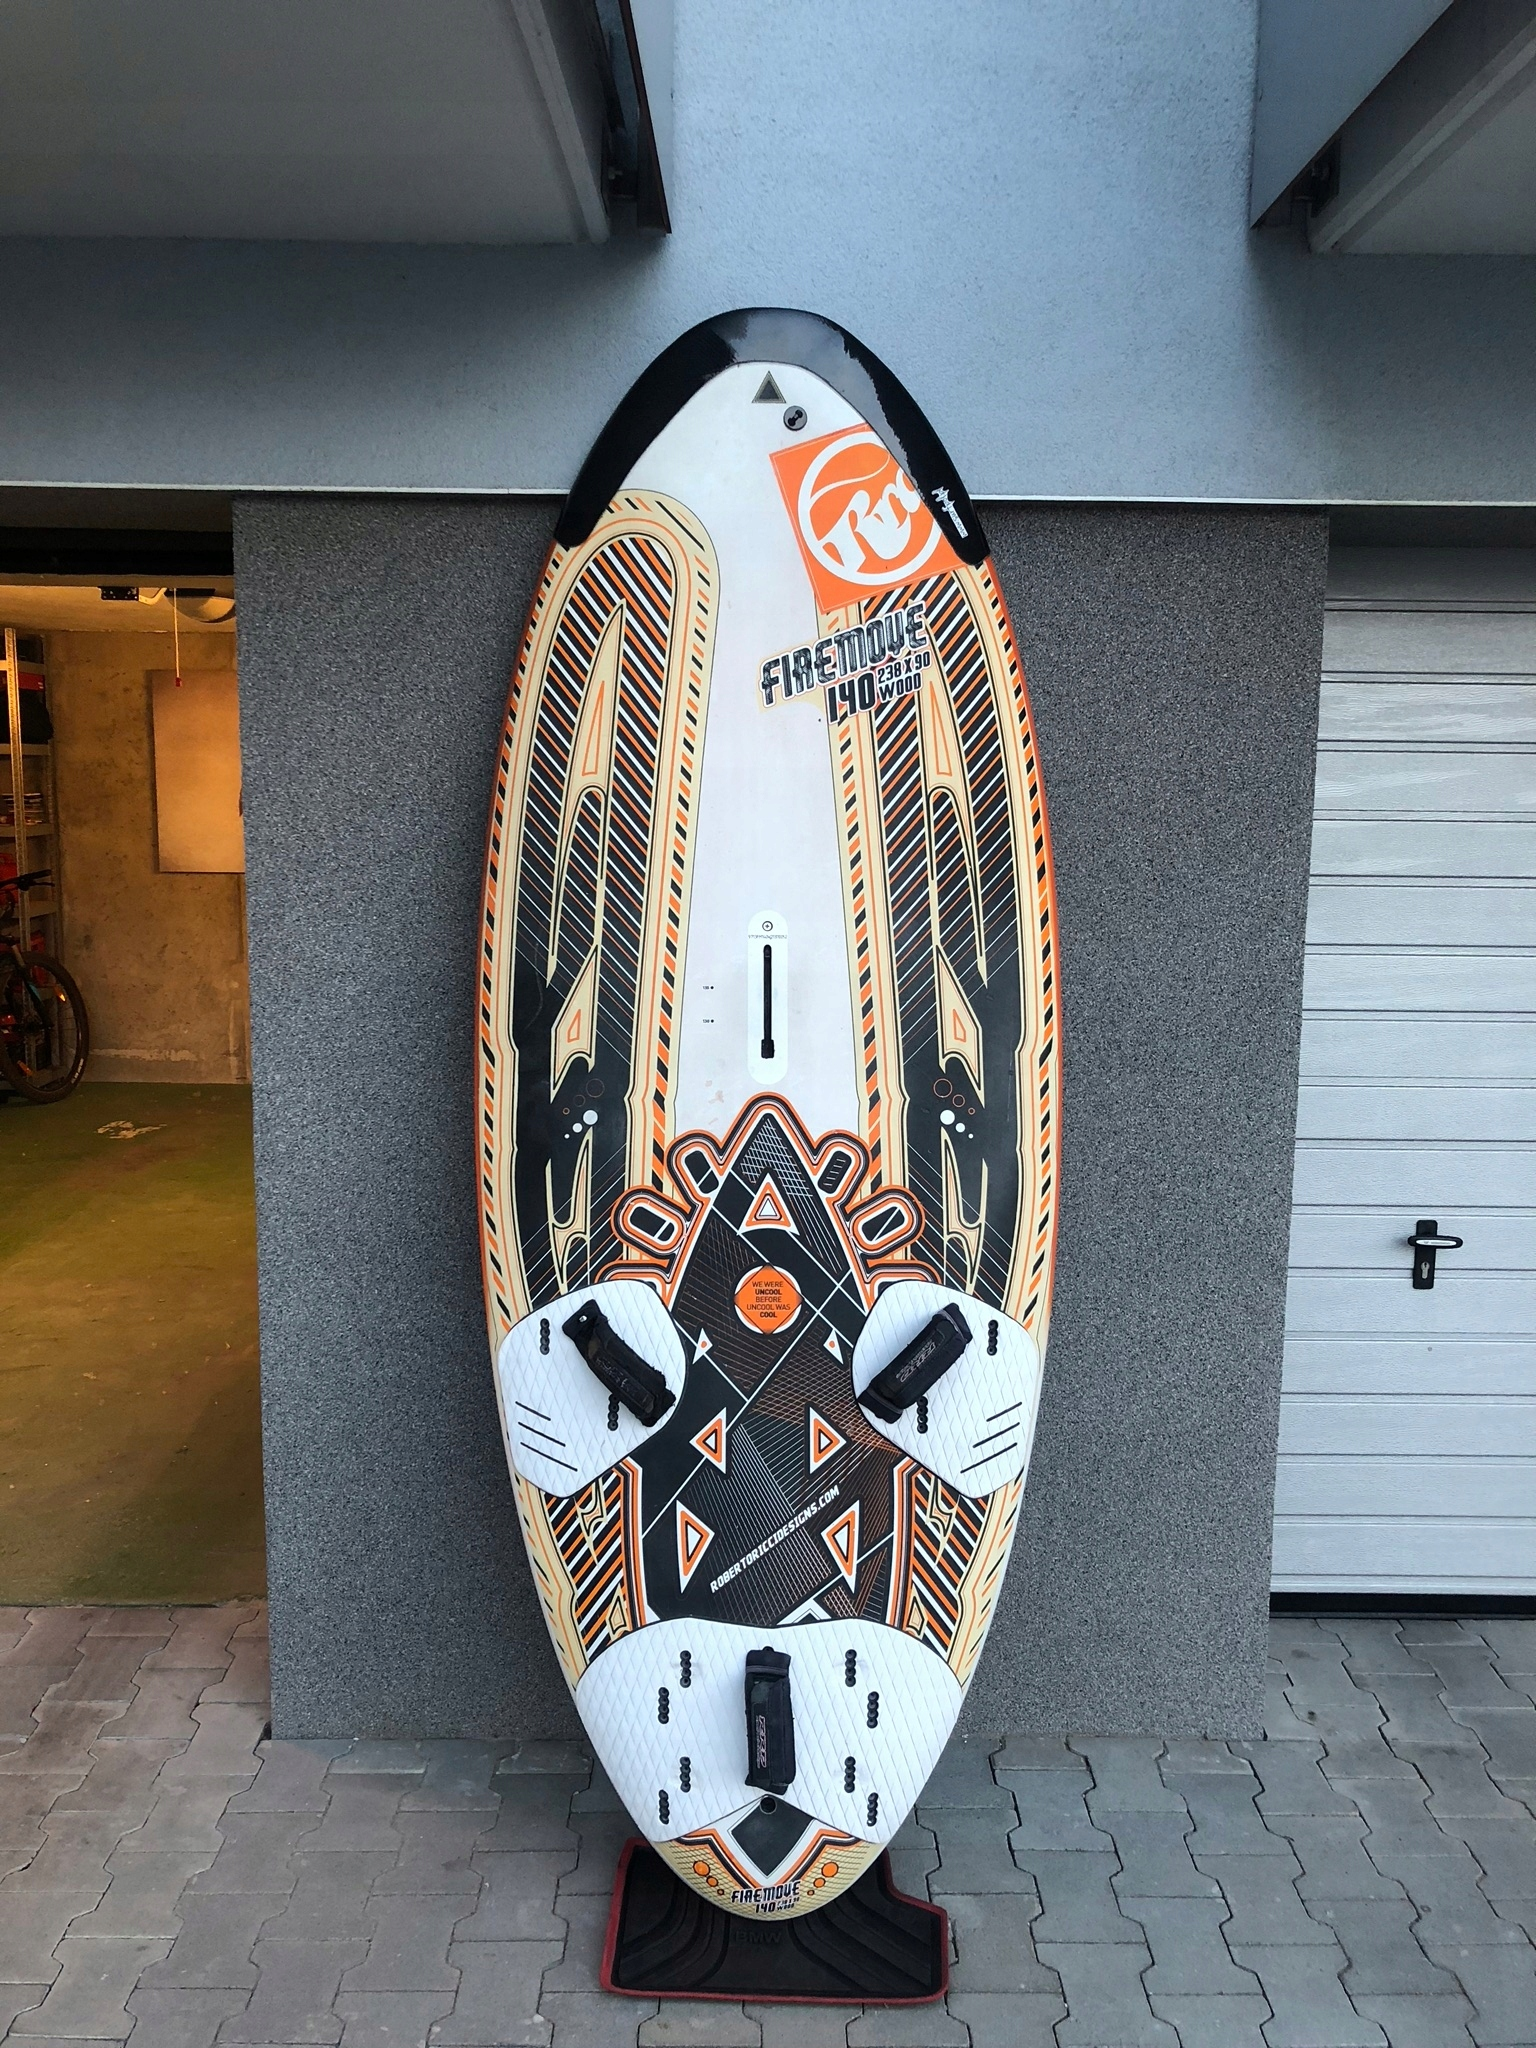 Deska windsurfing RRD Firemove 140l - 7554998436 - oficjalne